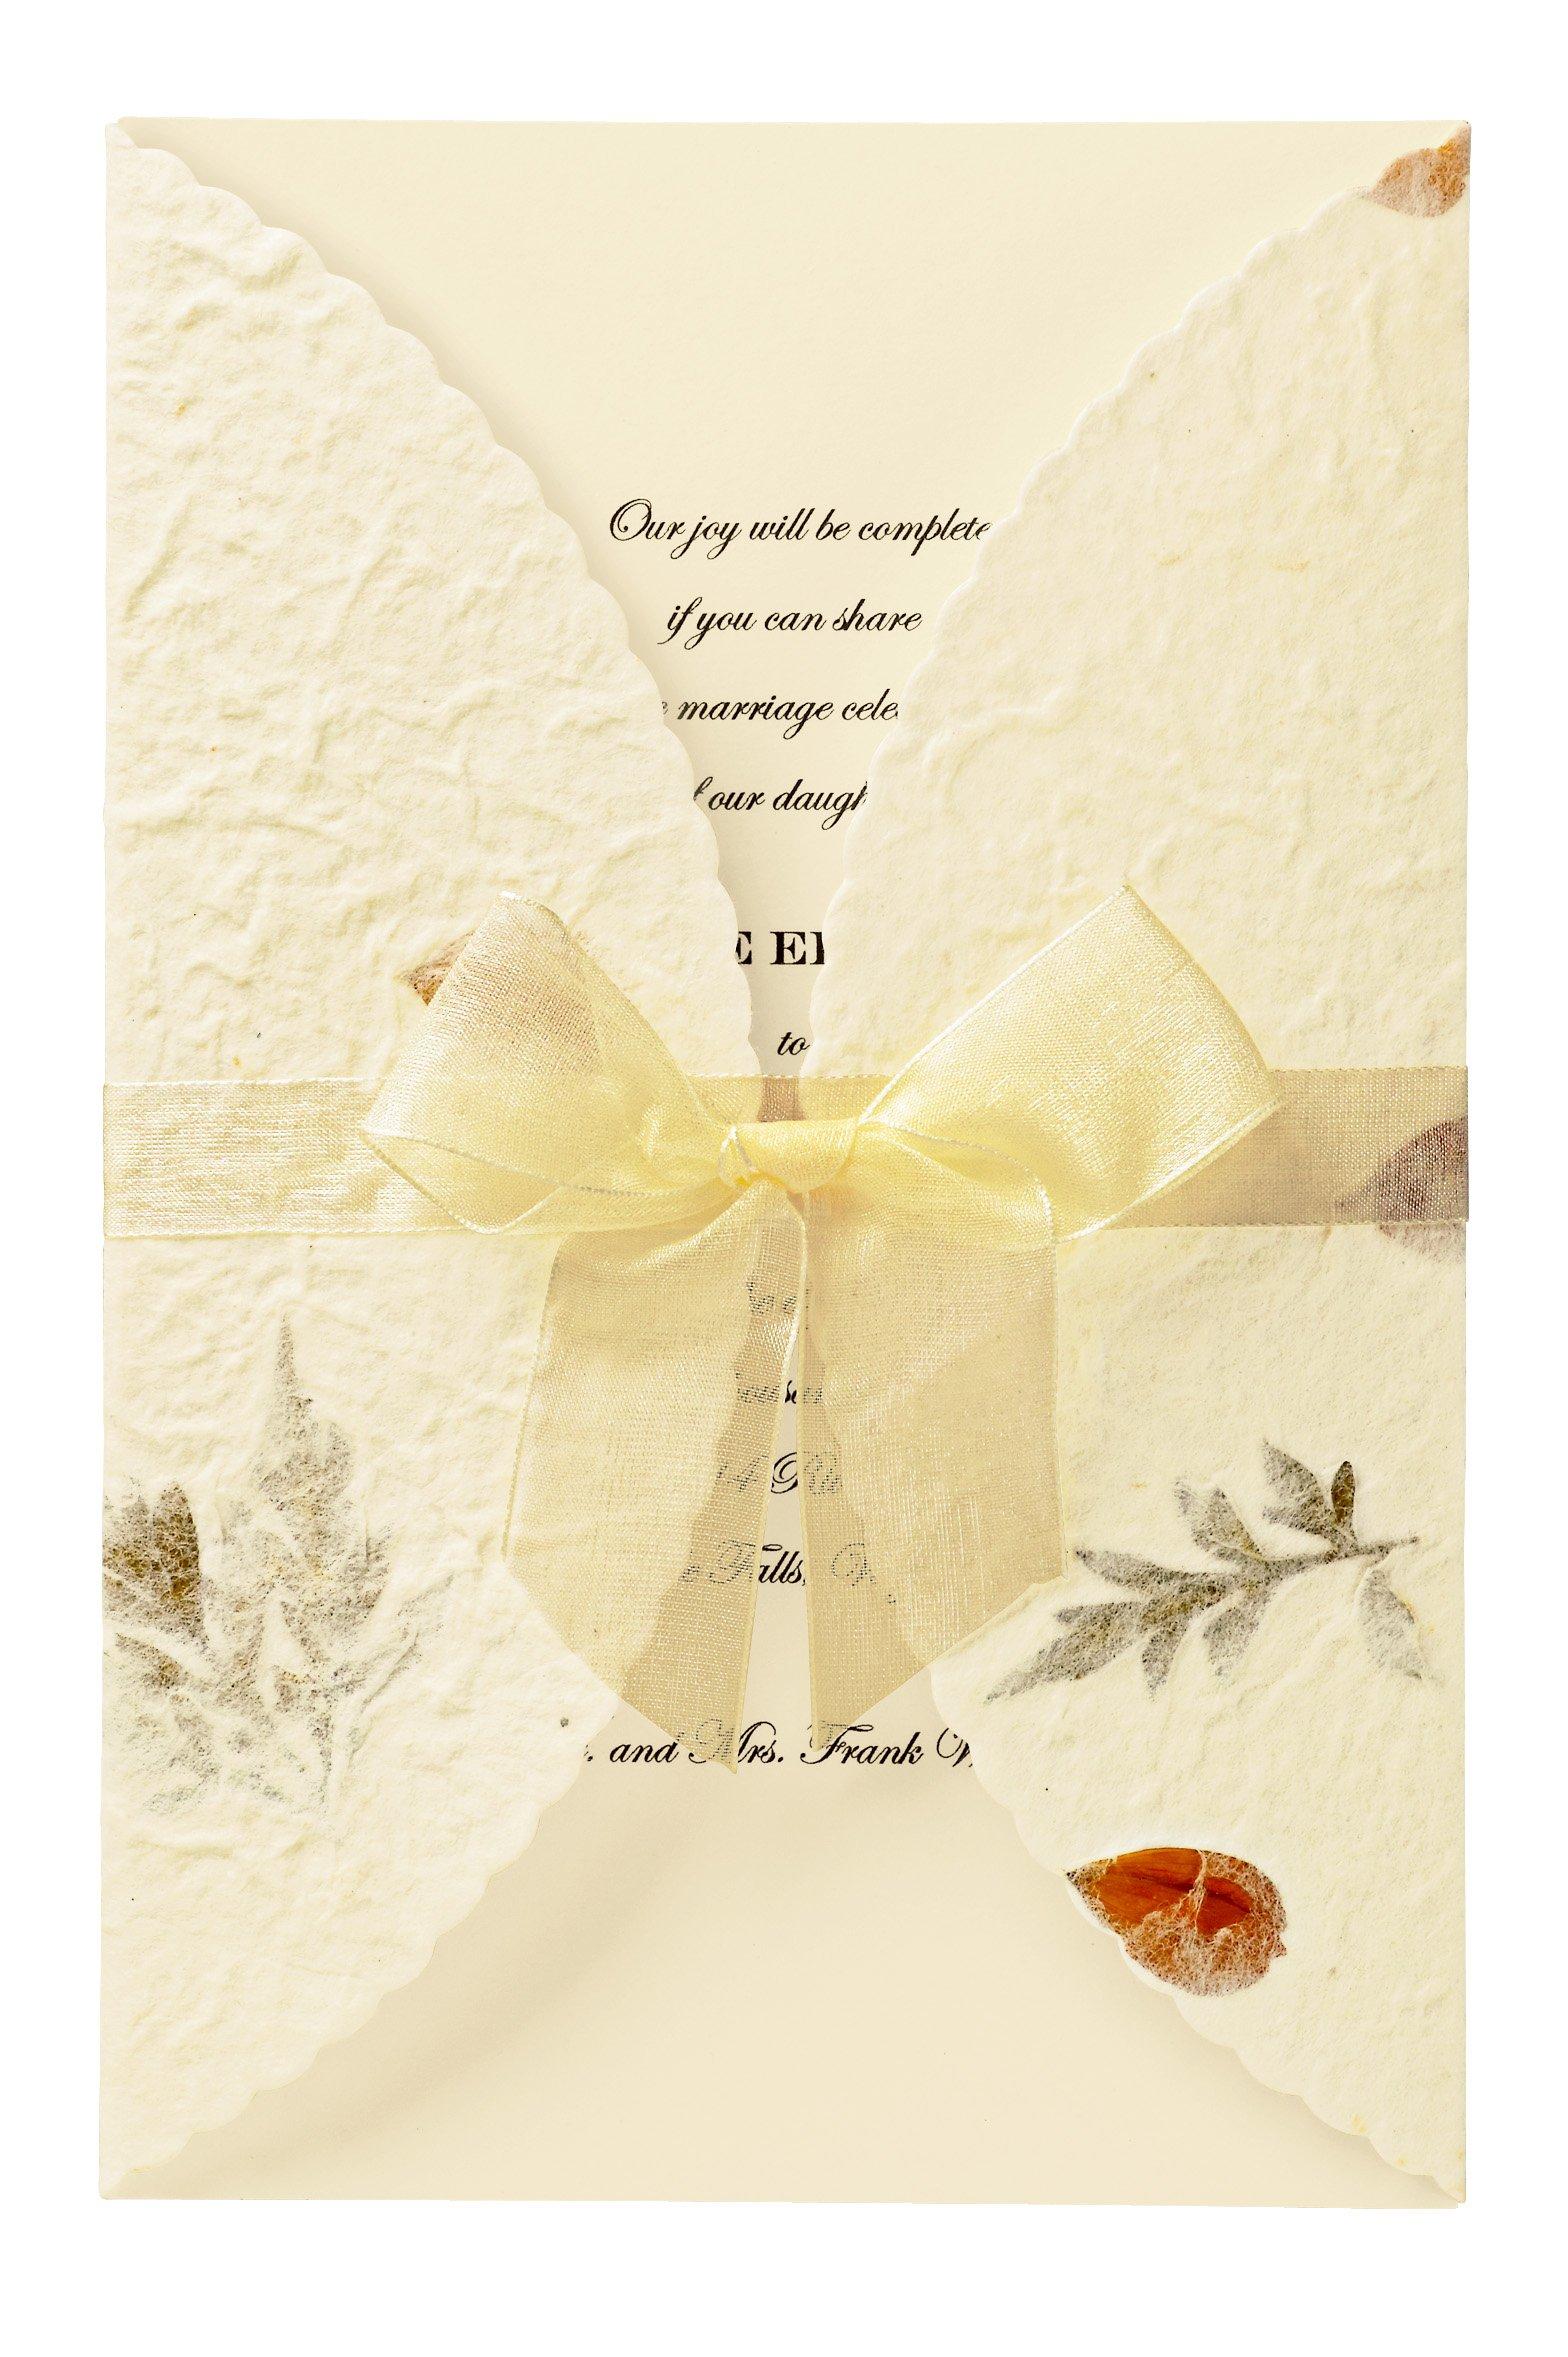 wilton wedding invitation - 28 images - set of 50 wilton wedding ...